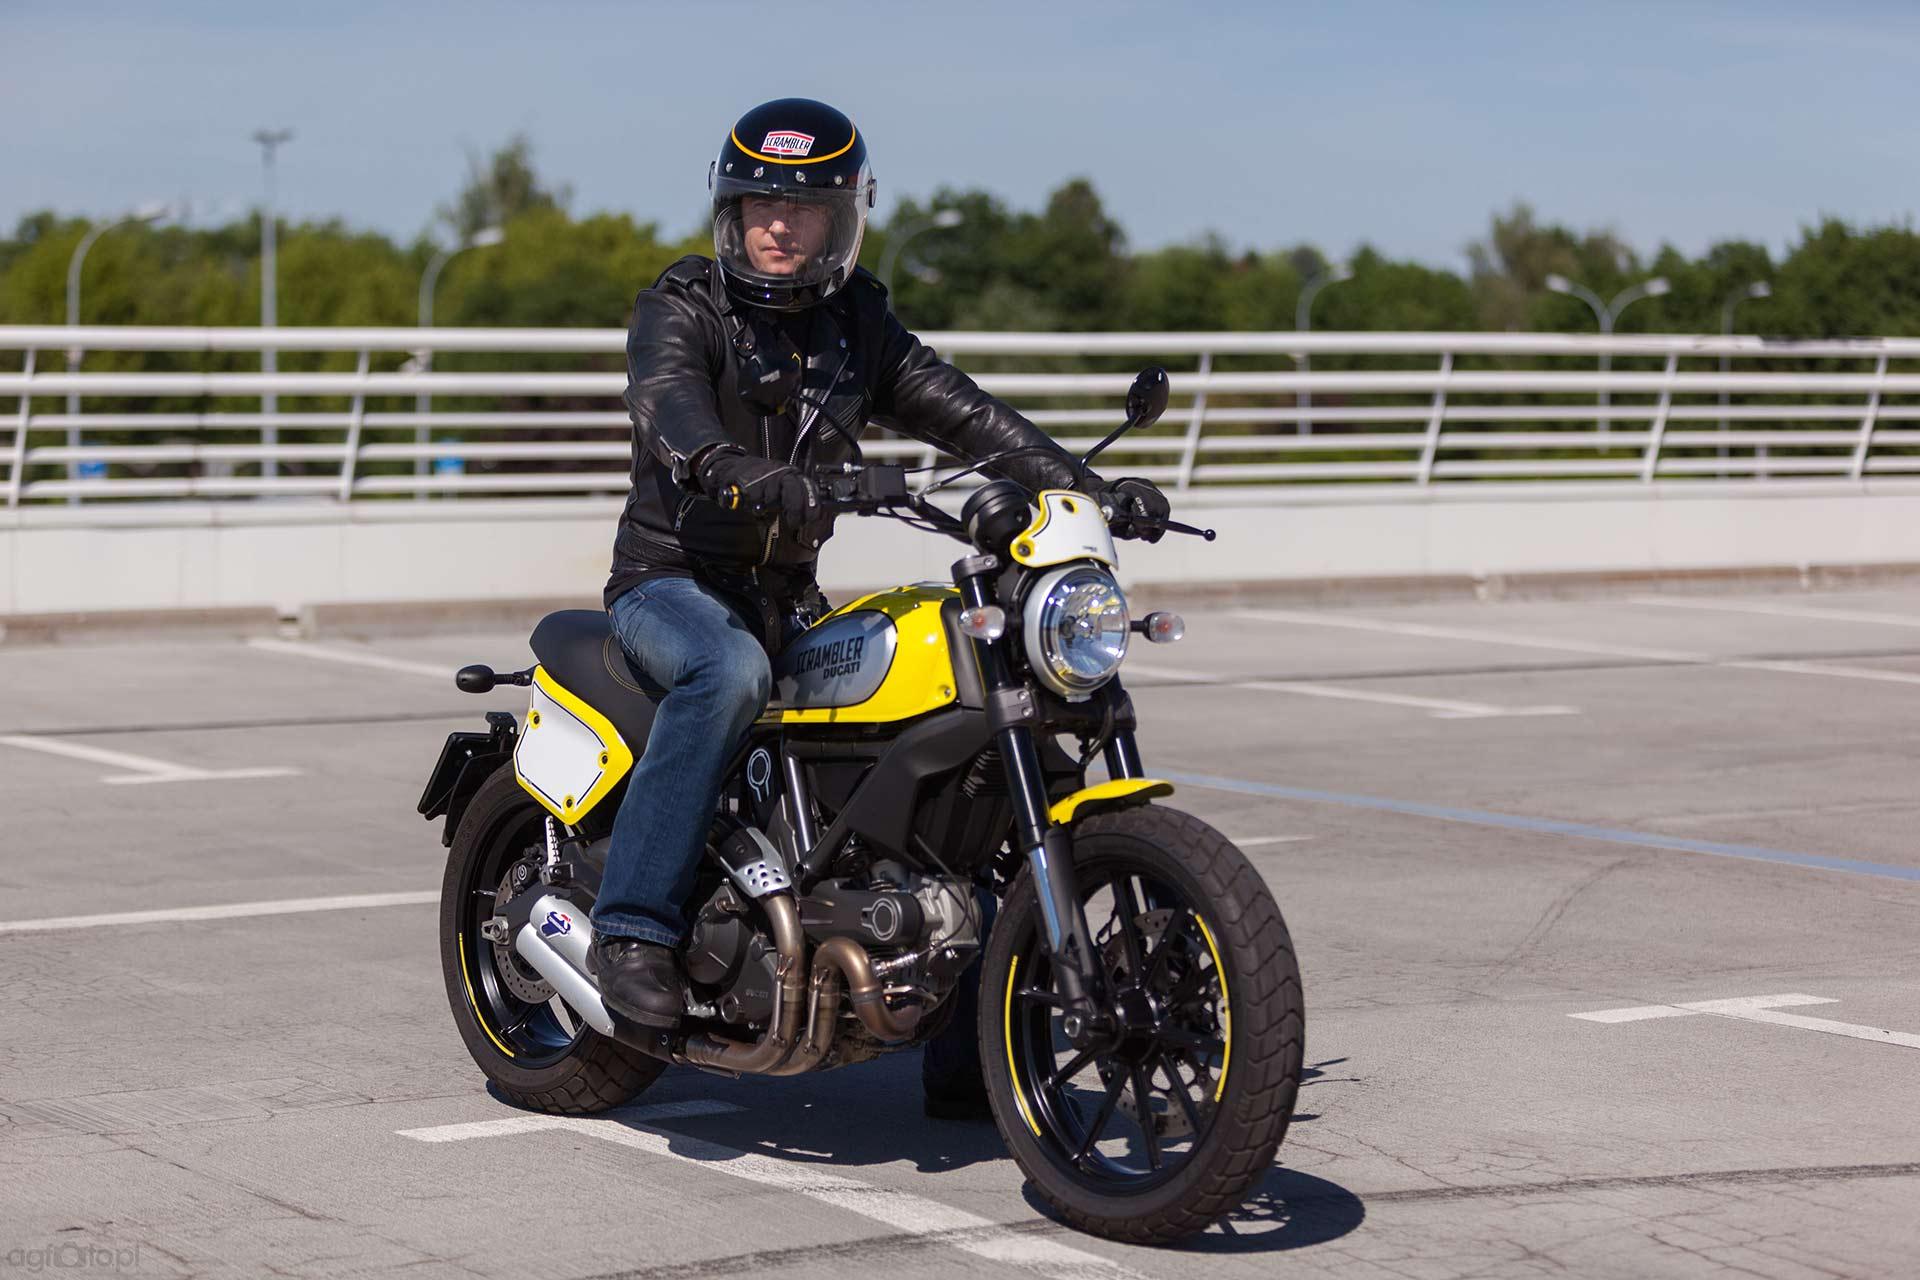 ducati_scrambler_parking_motocyklicznie